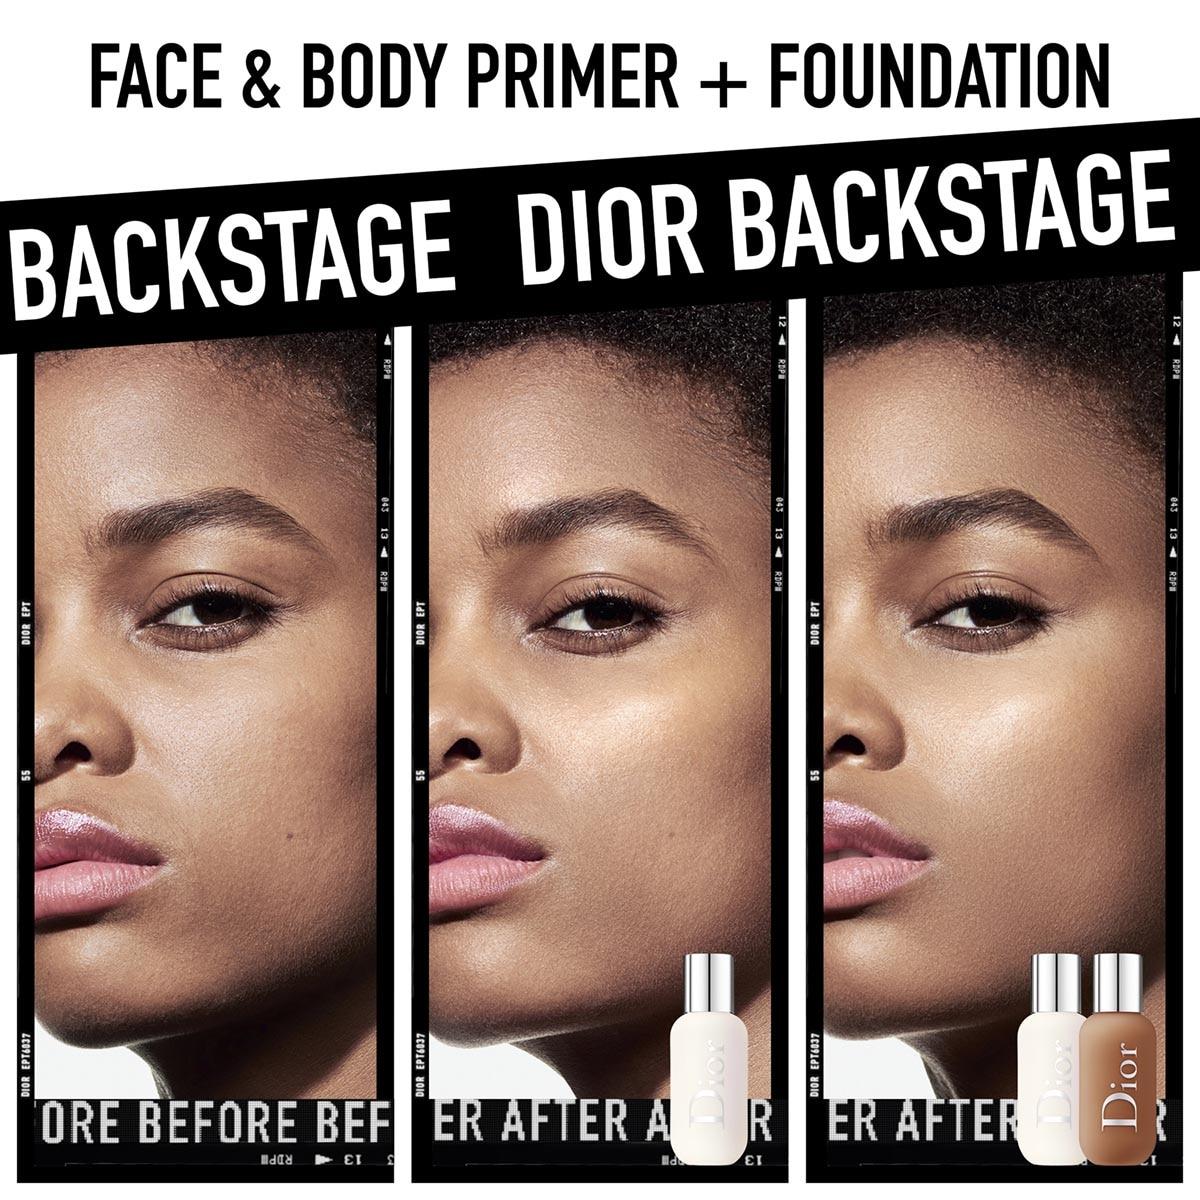 BACKSTAGE FACE & BODY PRIMER 50ML